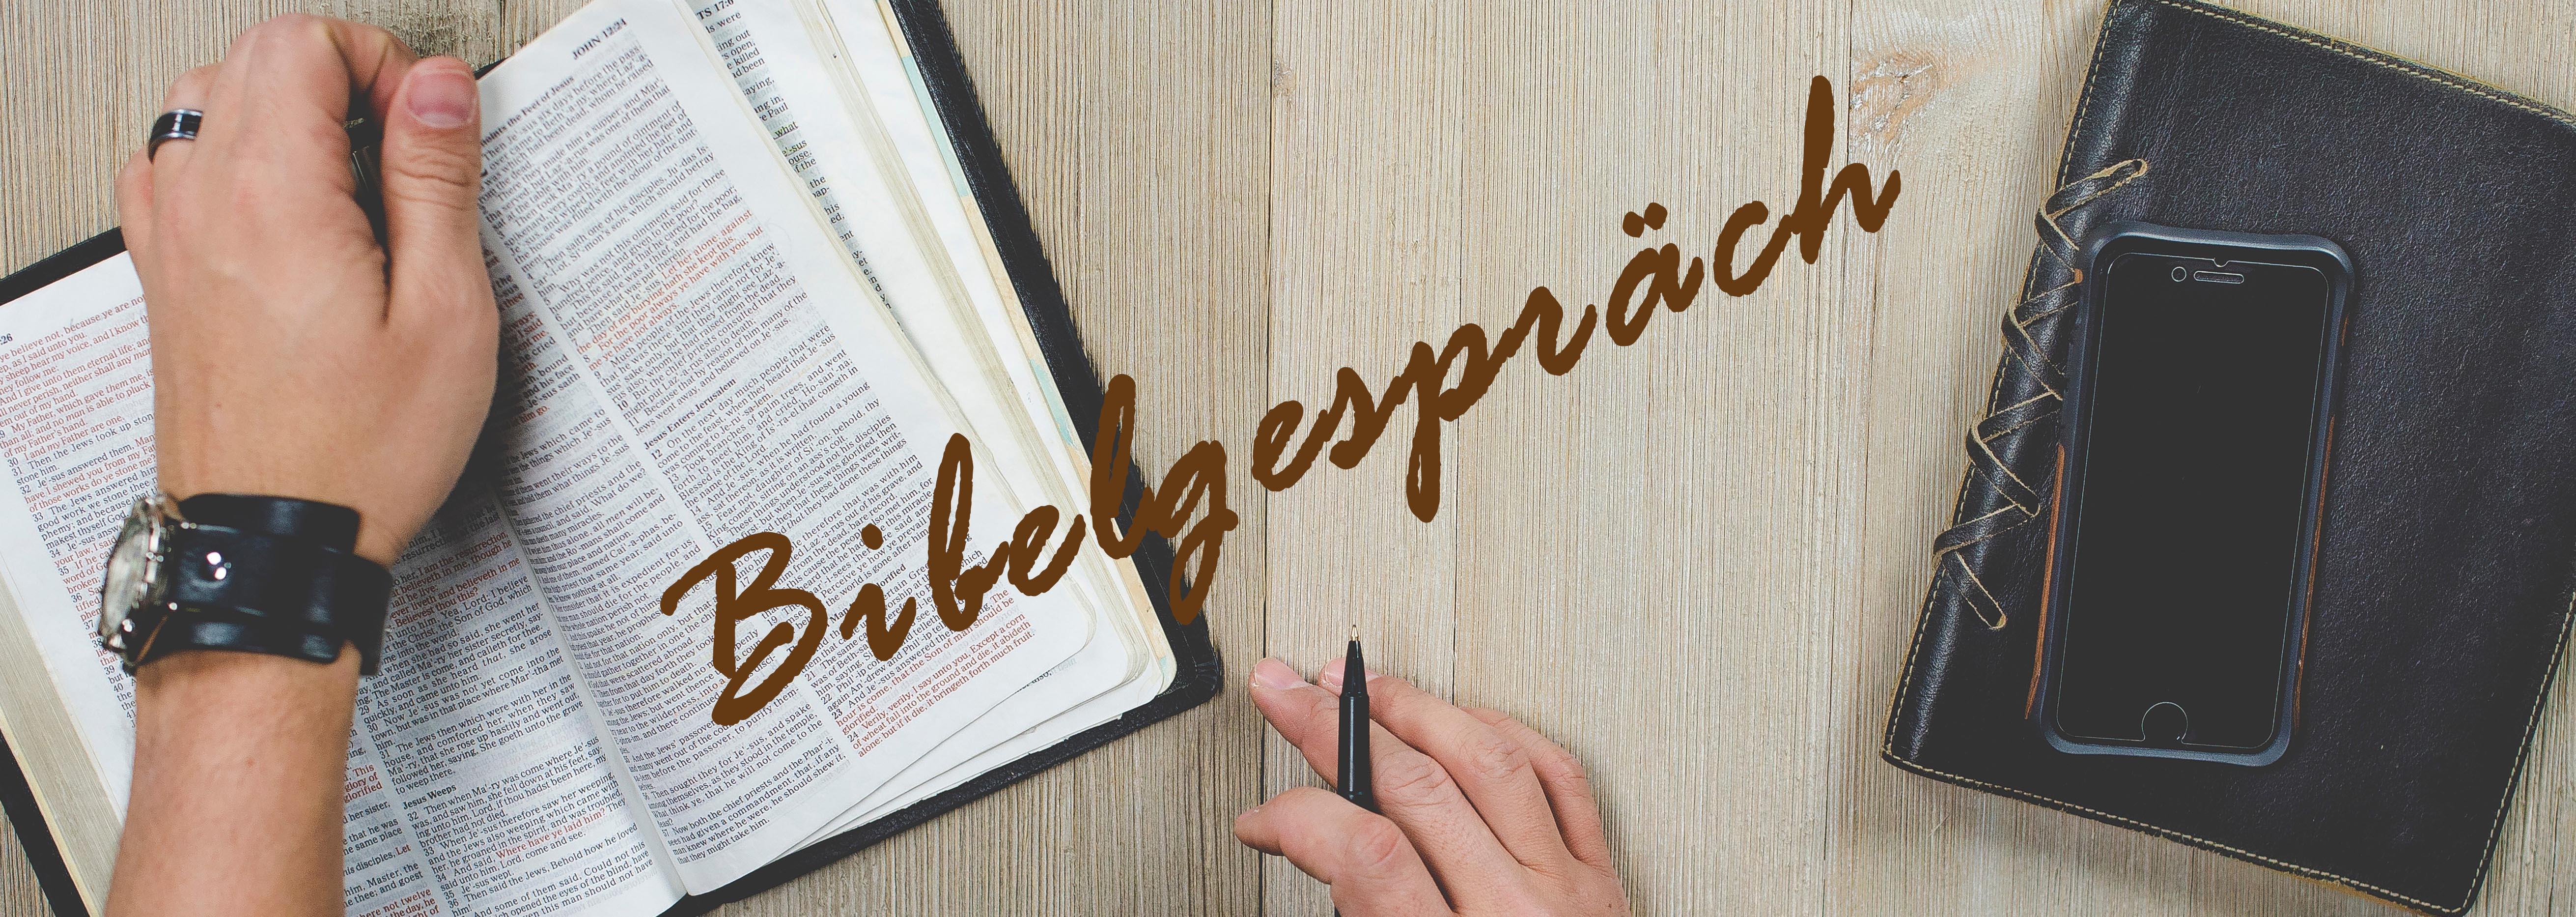 Bibelgespräch